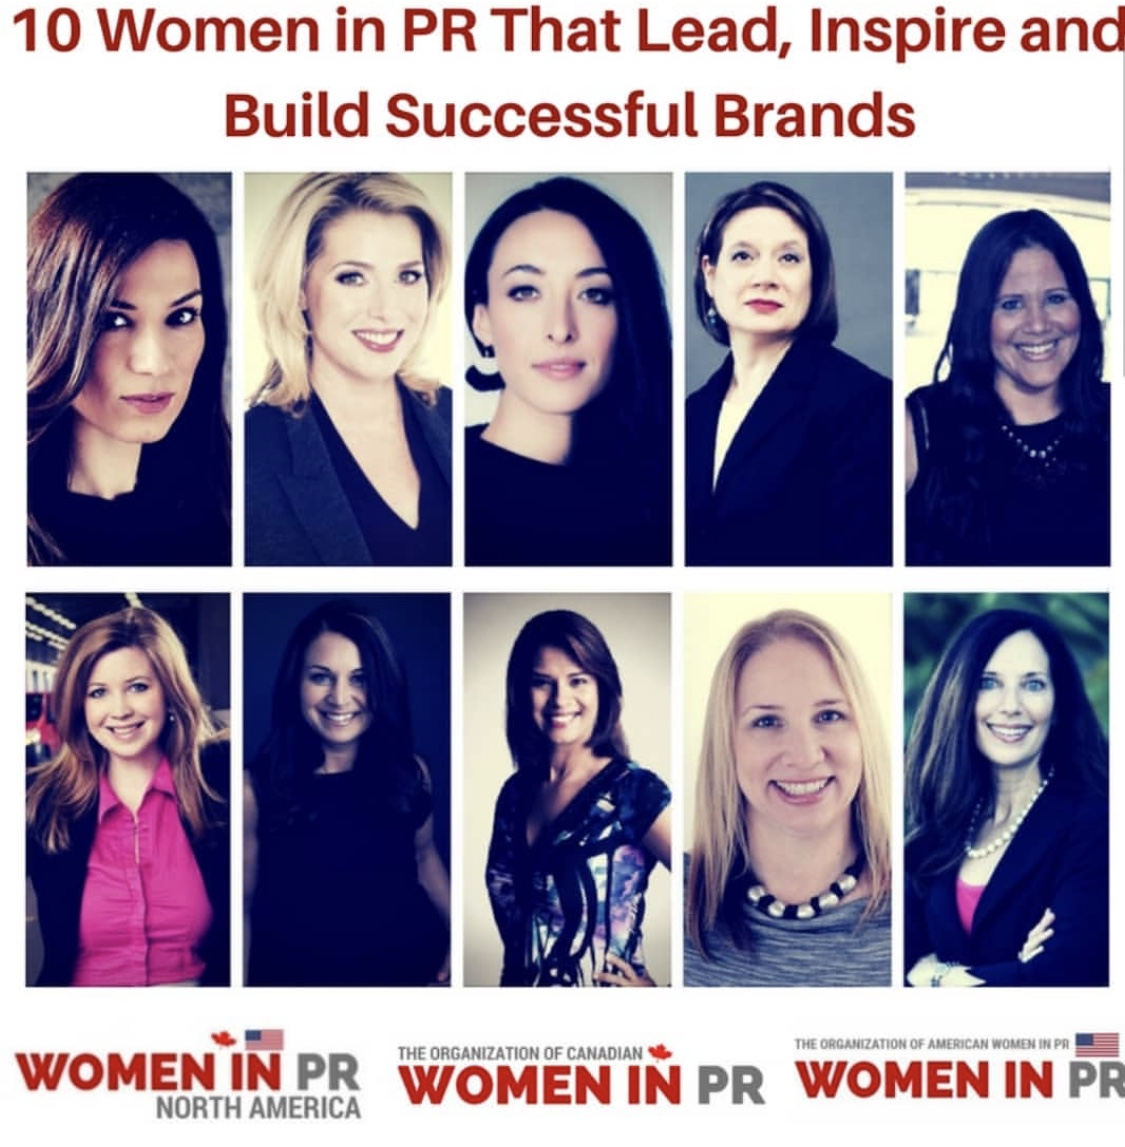 10PRwomen.jpg